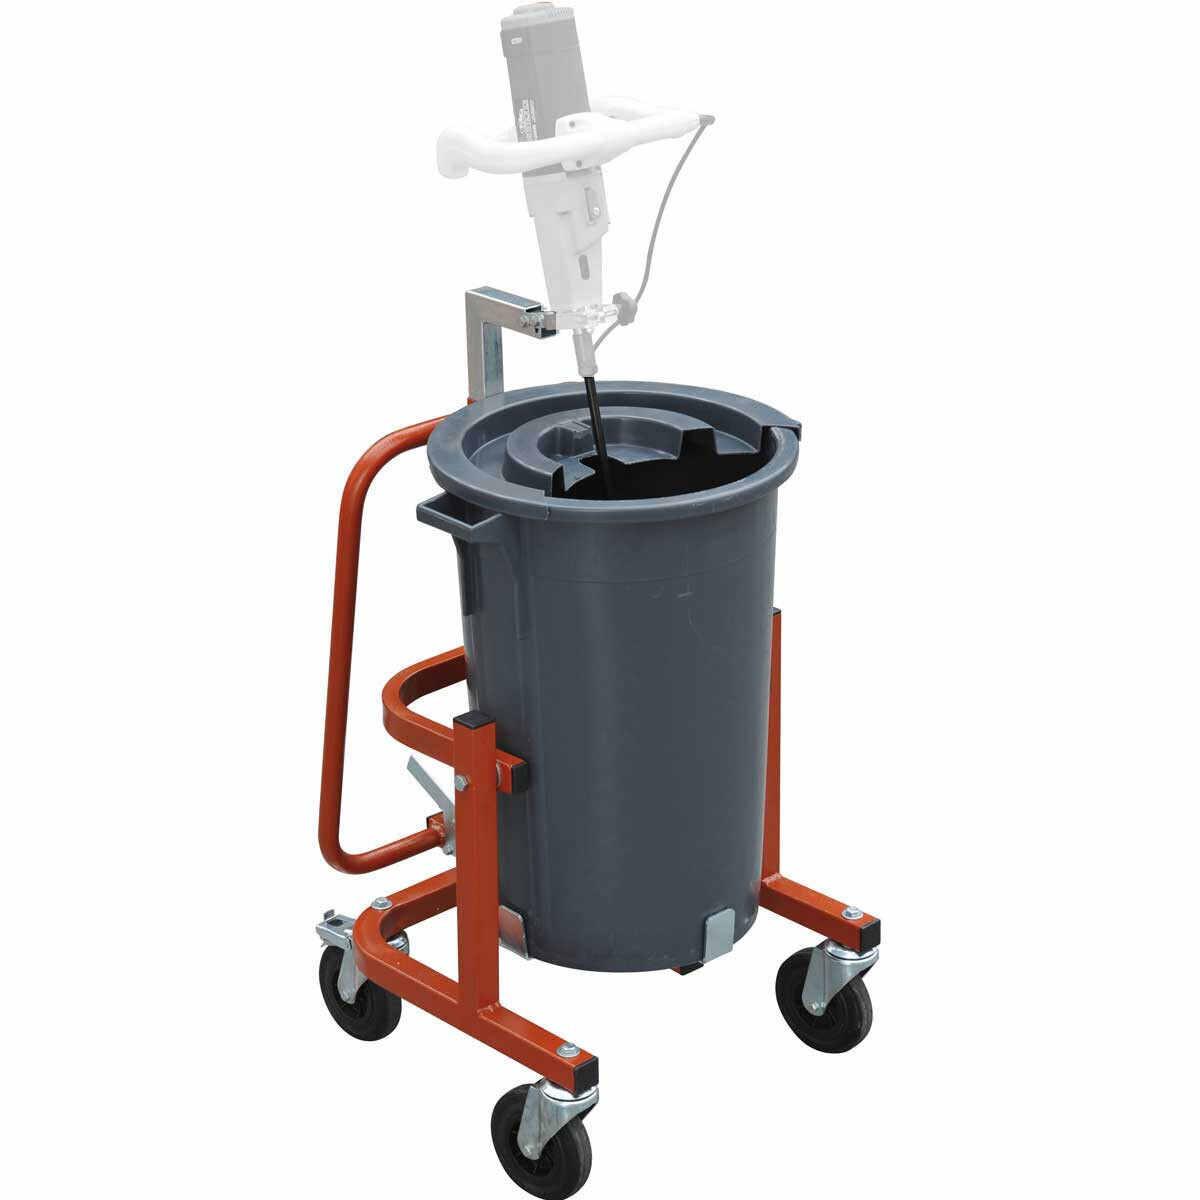 Raimondi Portable Mortar Mix